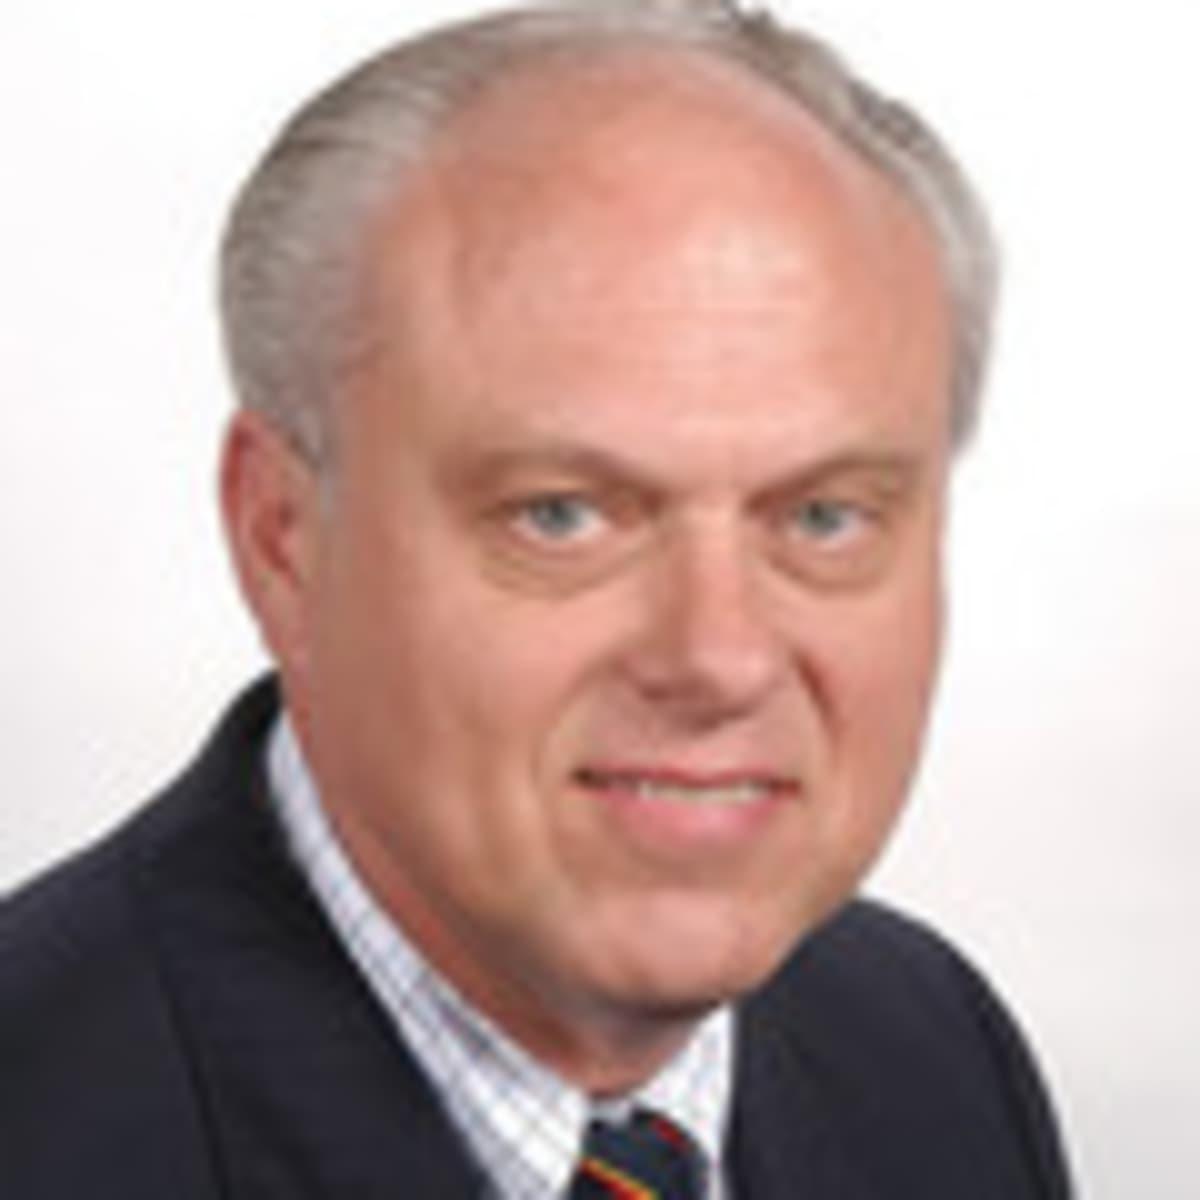 Dr Gerald Larson Md Louisville Ky Surgeon